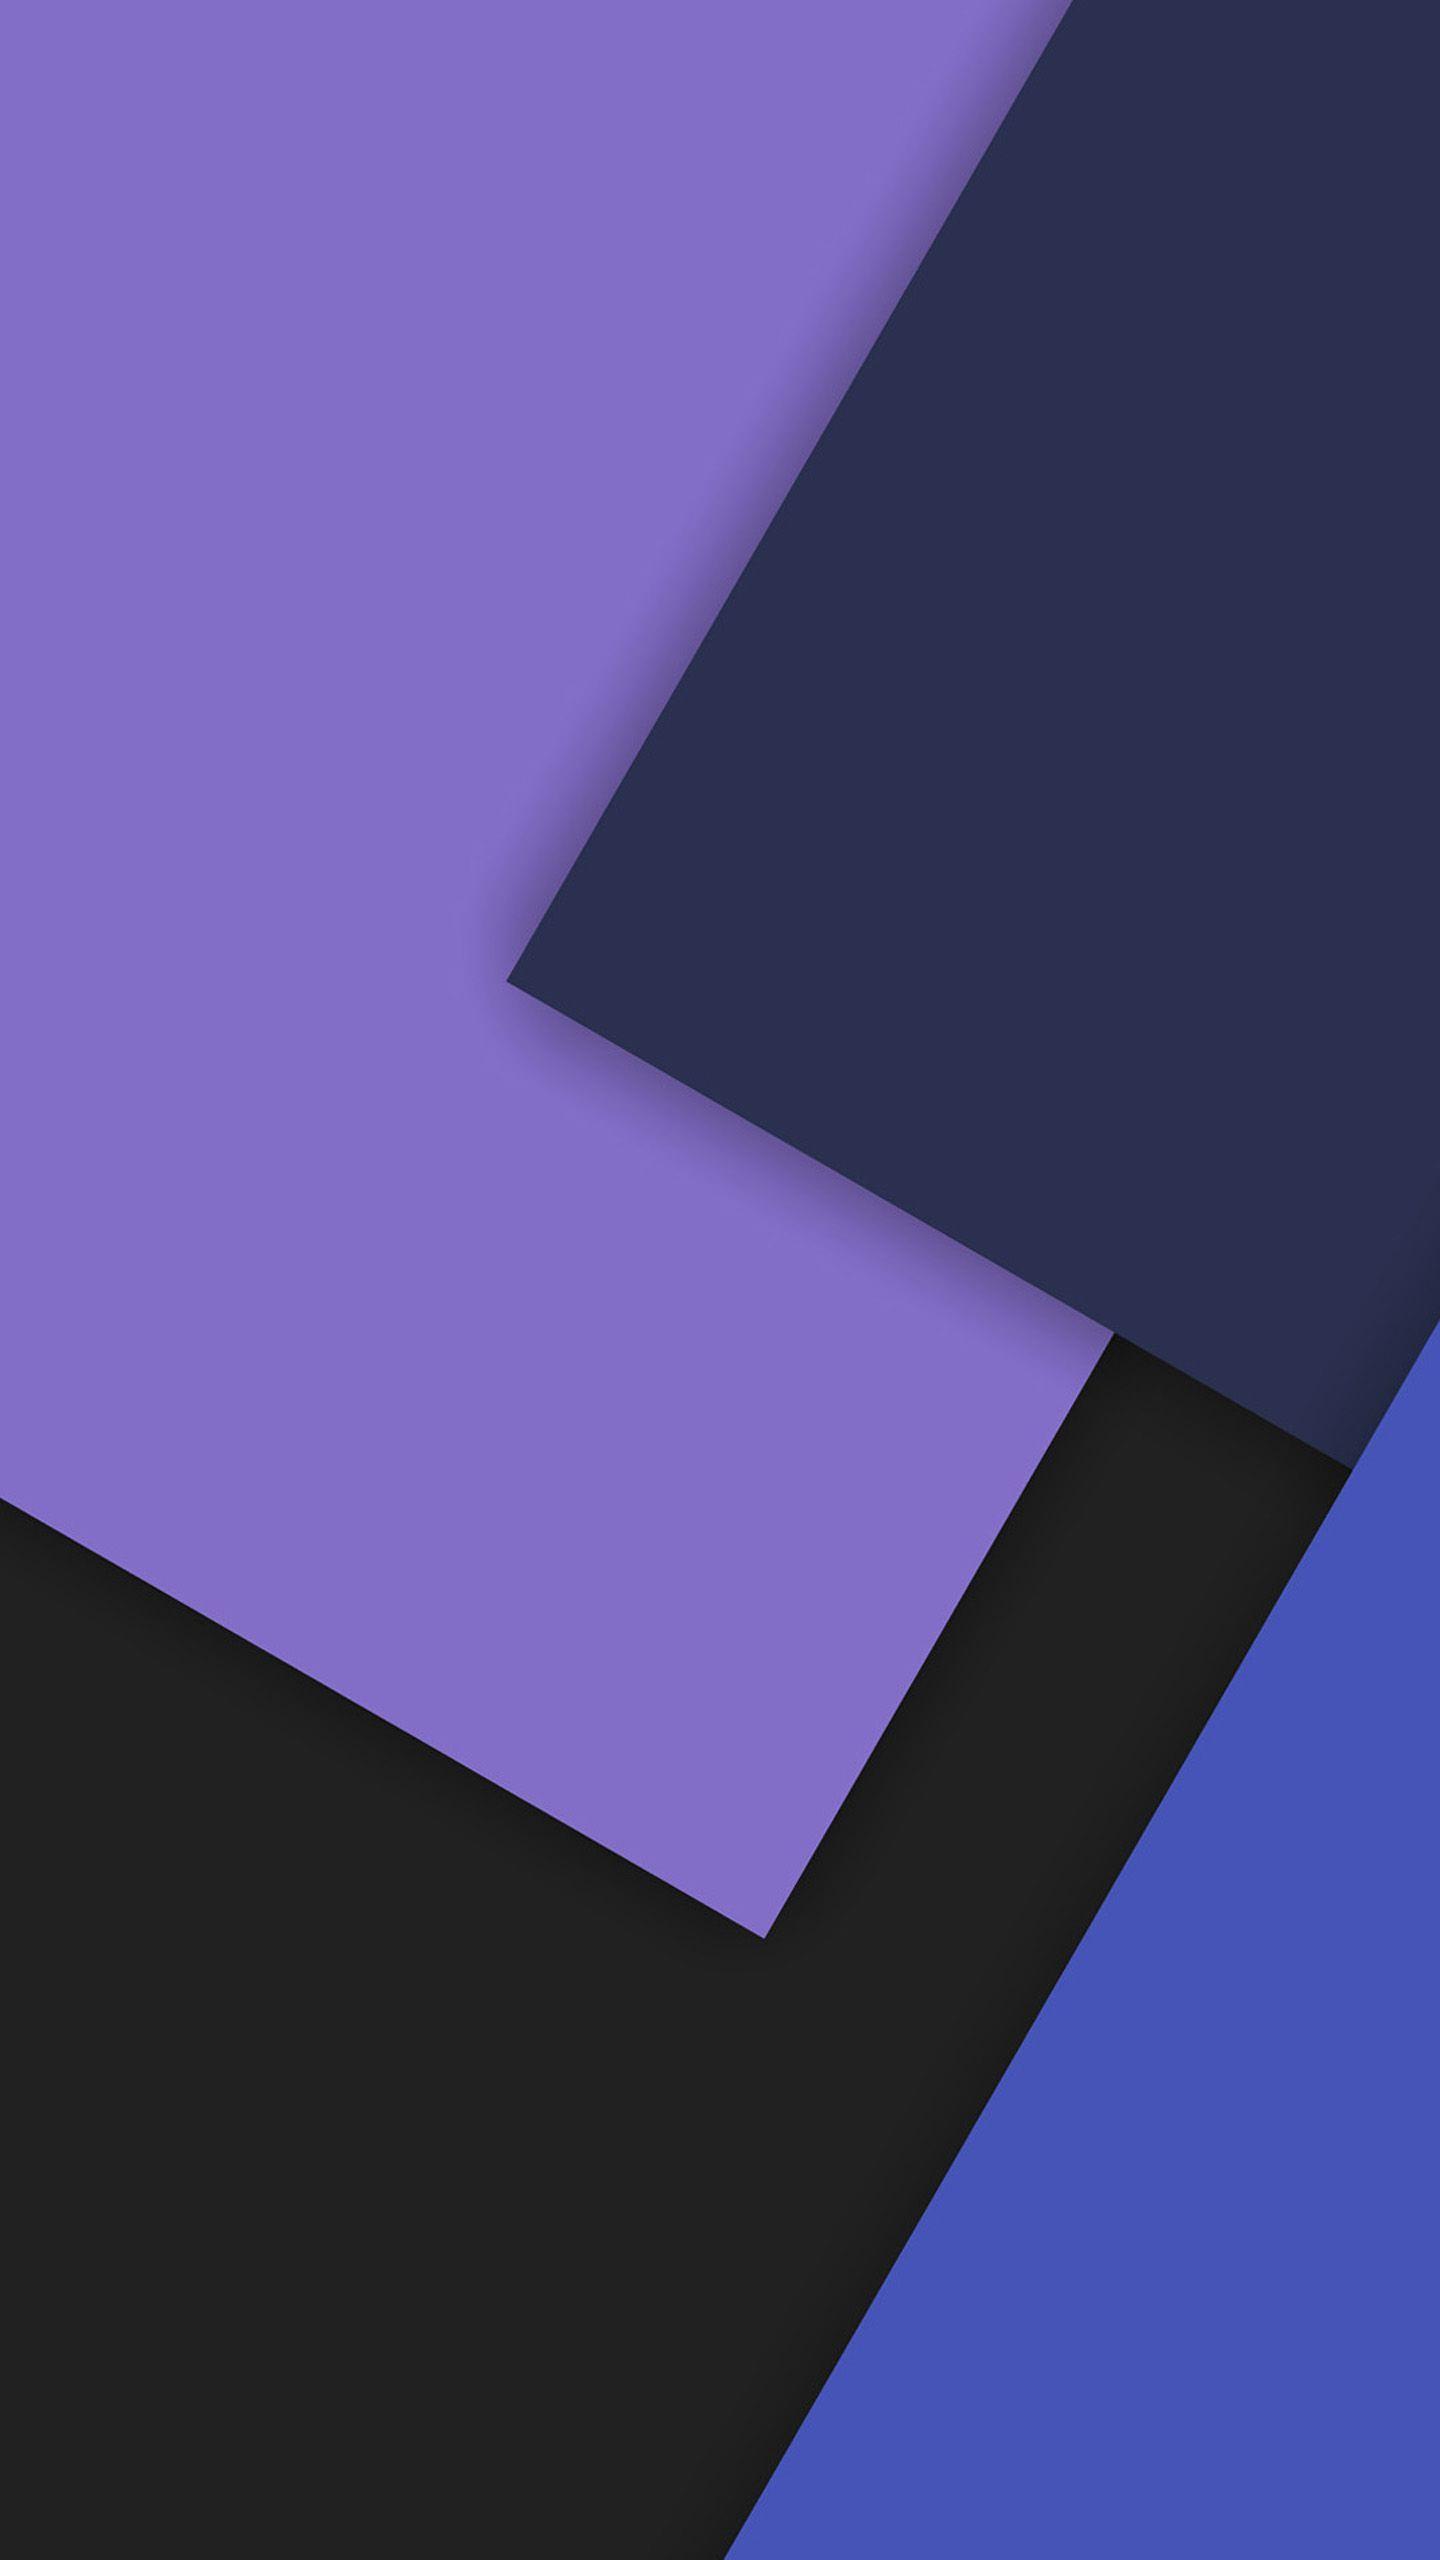 Wallpaper iphone geometric - Geometric Live Background Http Wallpapers And Backgrounds Net Geometric